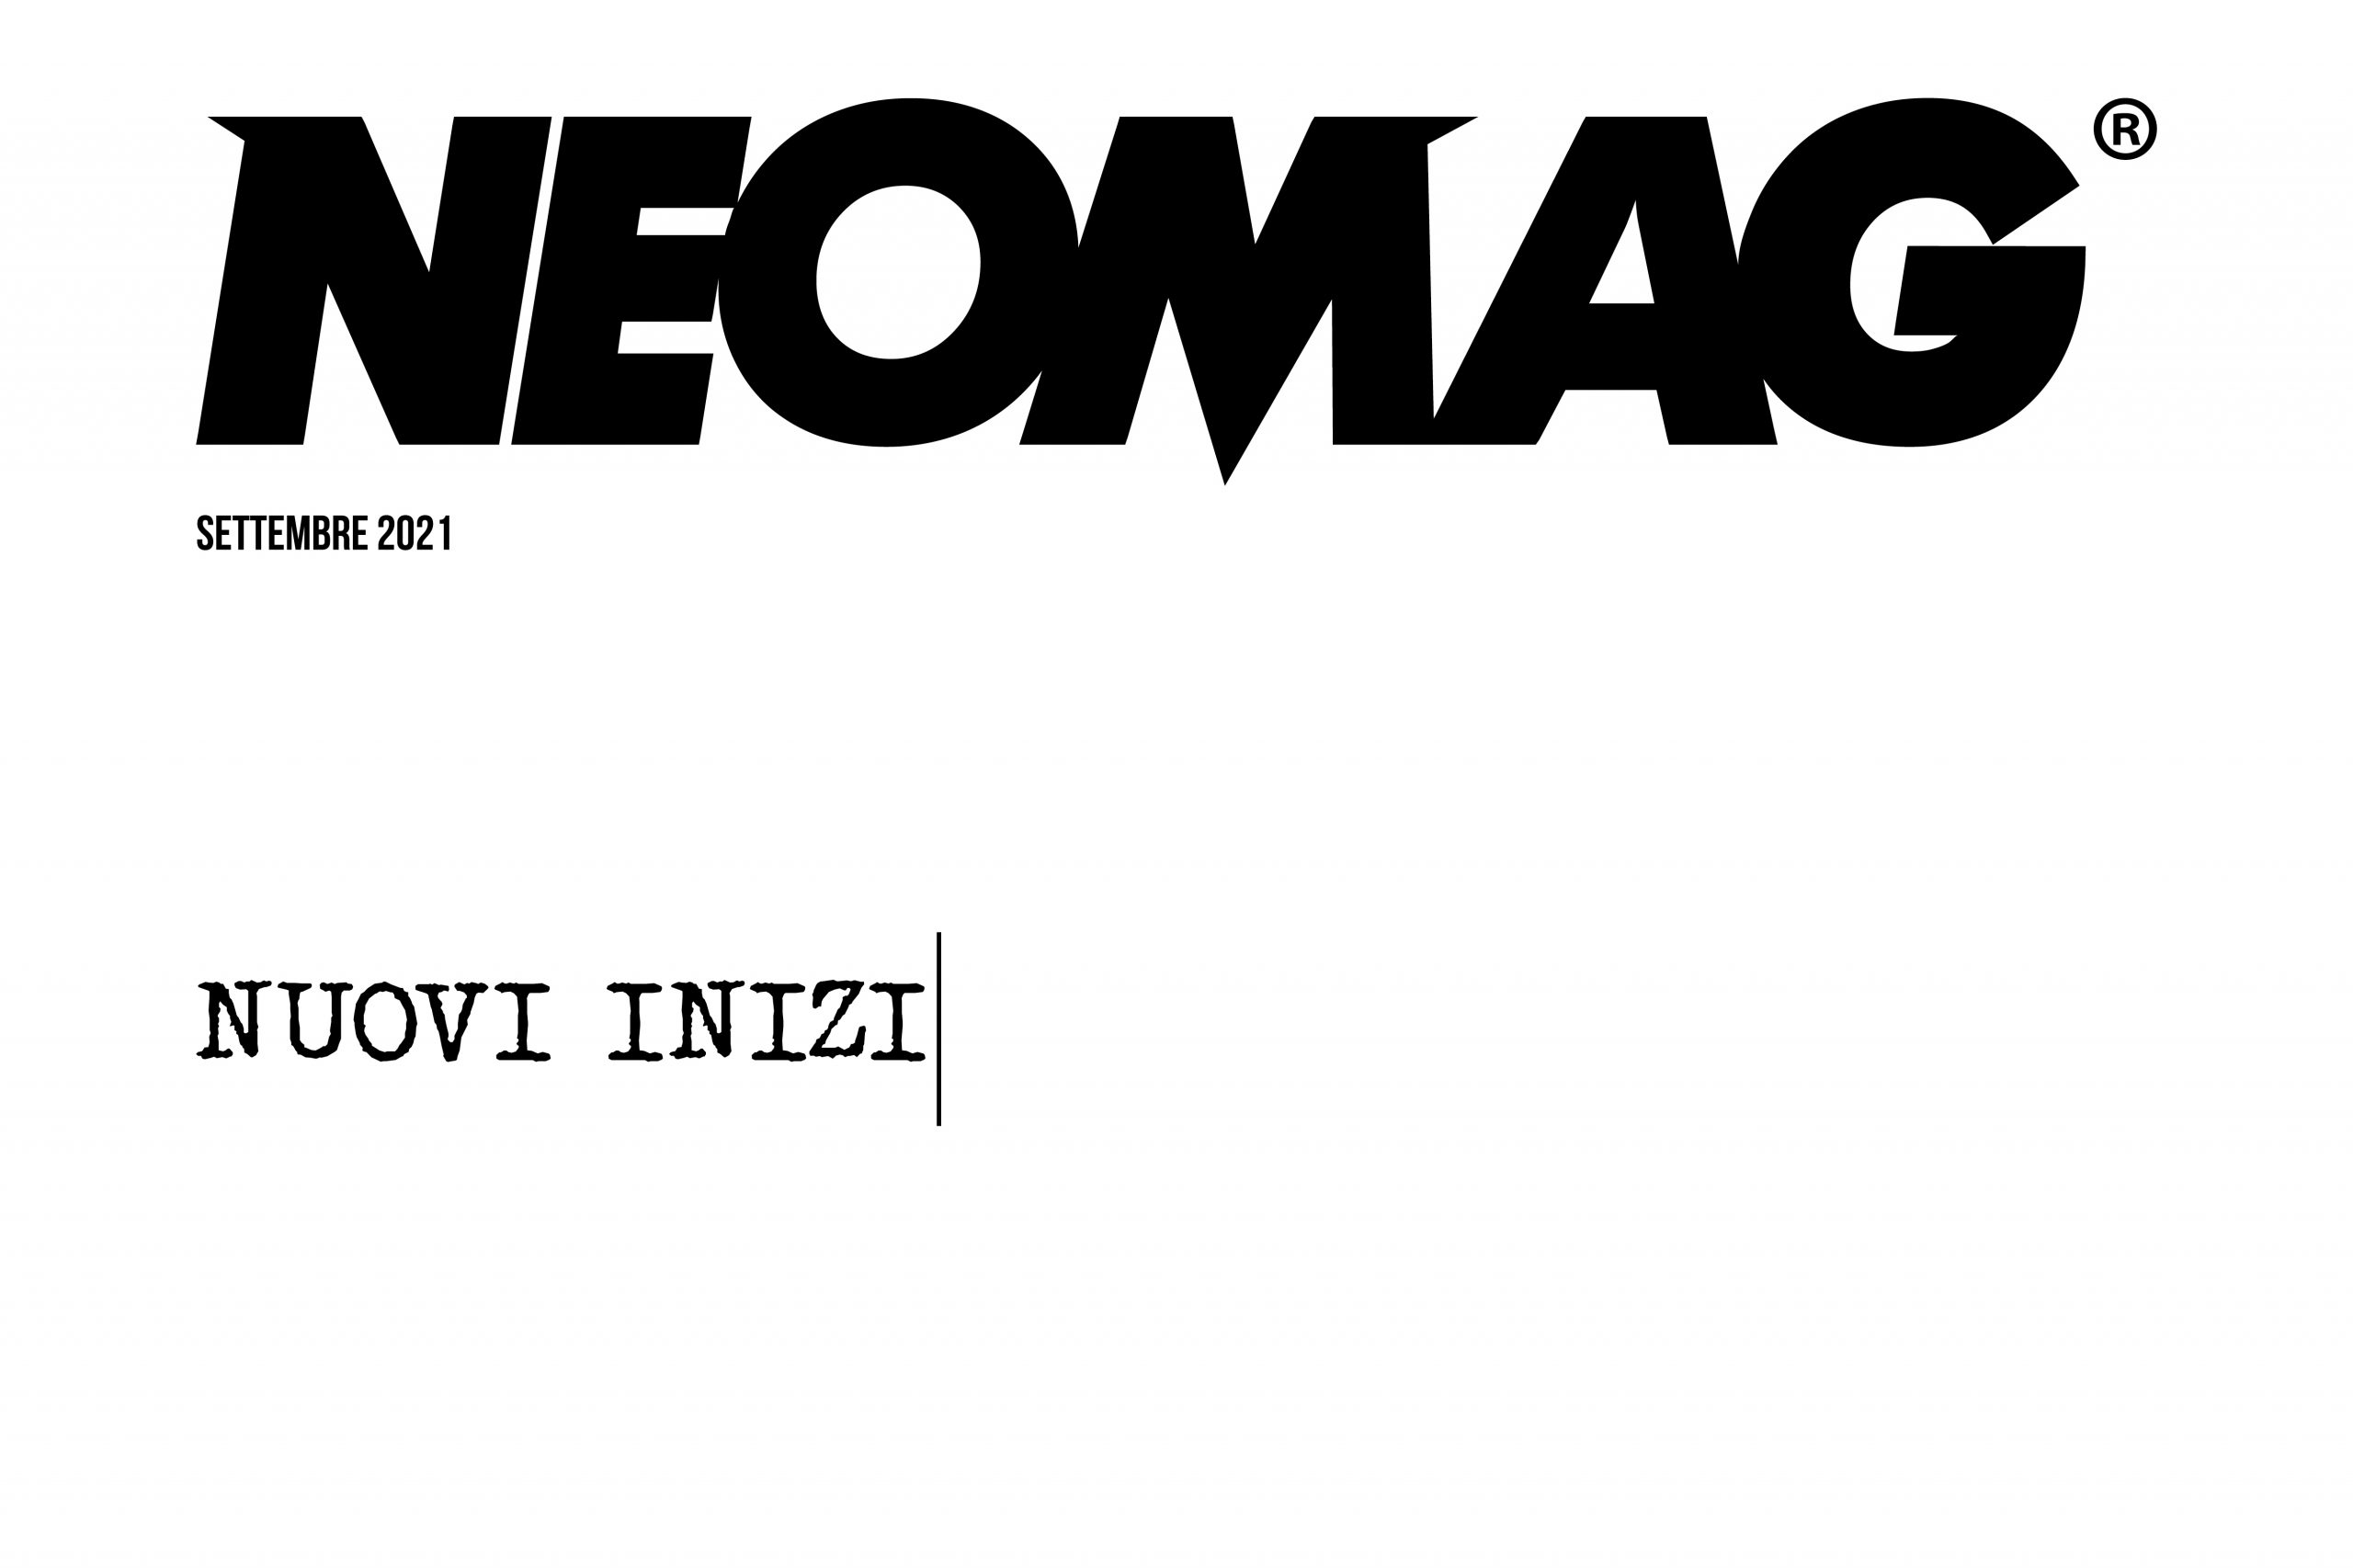 Nuovi Inizi Cover - Neomag.